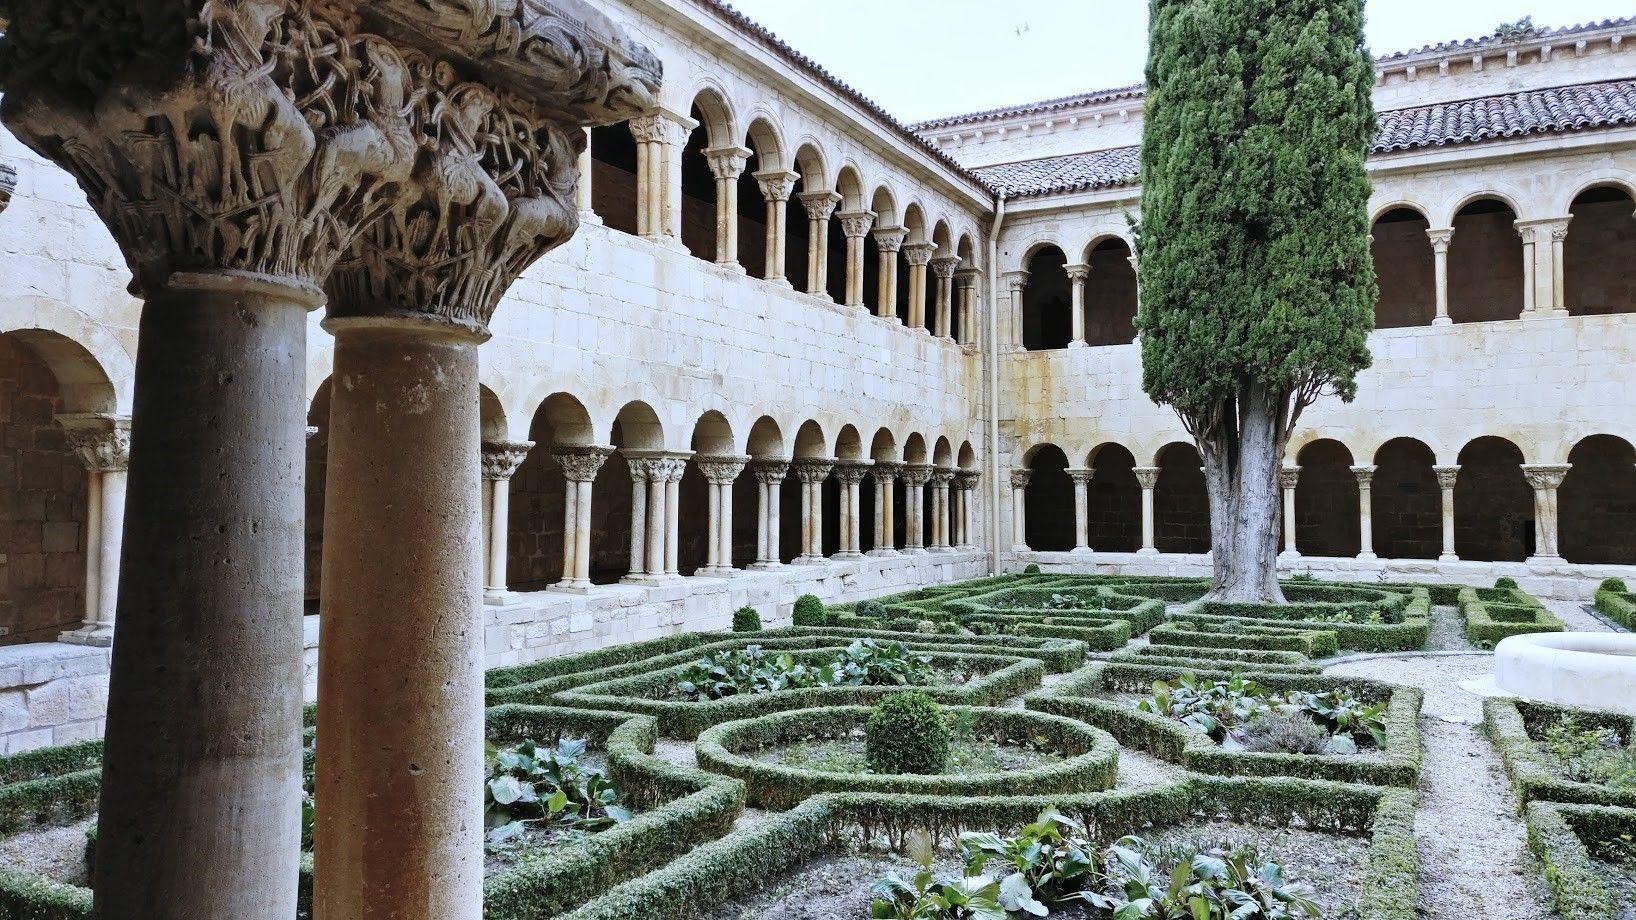 Monasterio de Silos, Burgos. Visitas de interés cultural, que busca el turista rural #TurismoRural #InterésCultural #AnaUtrillaInteriorismo